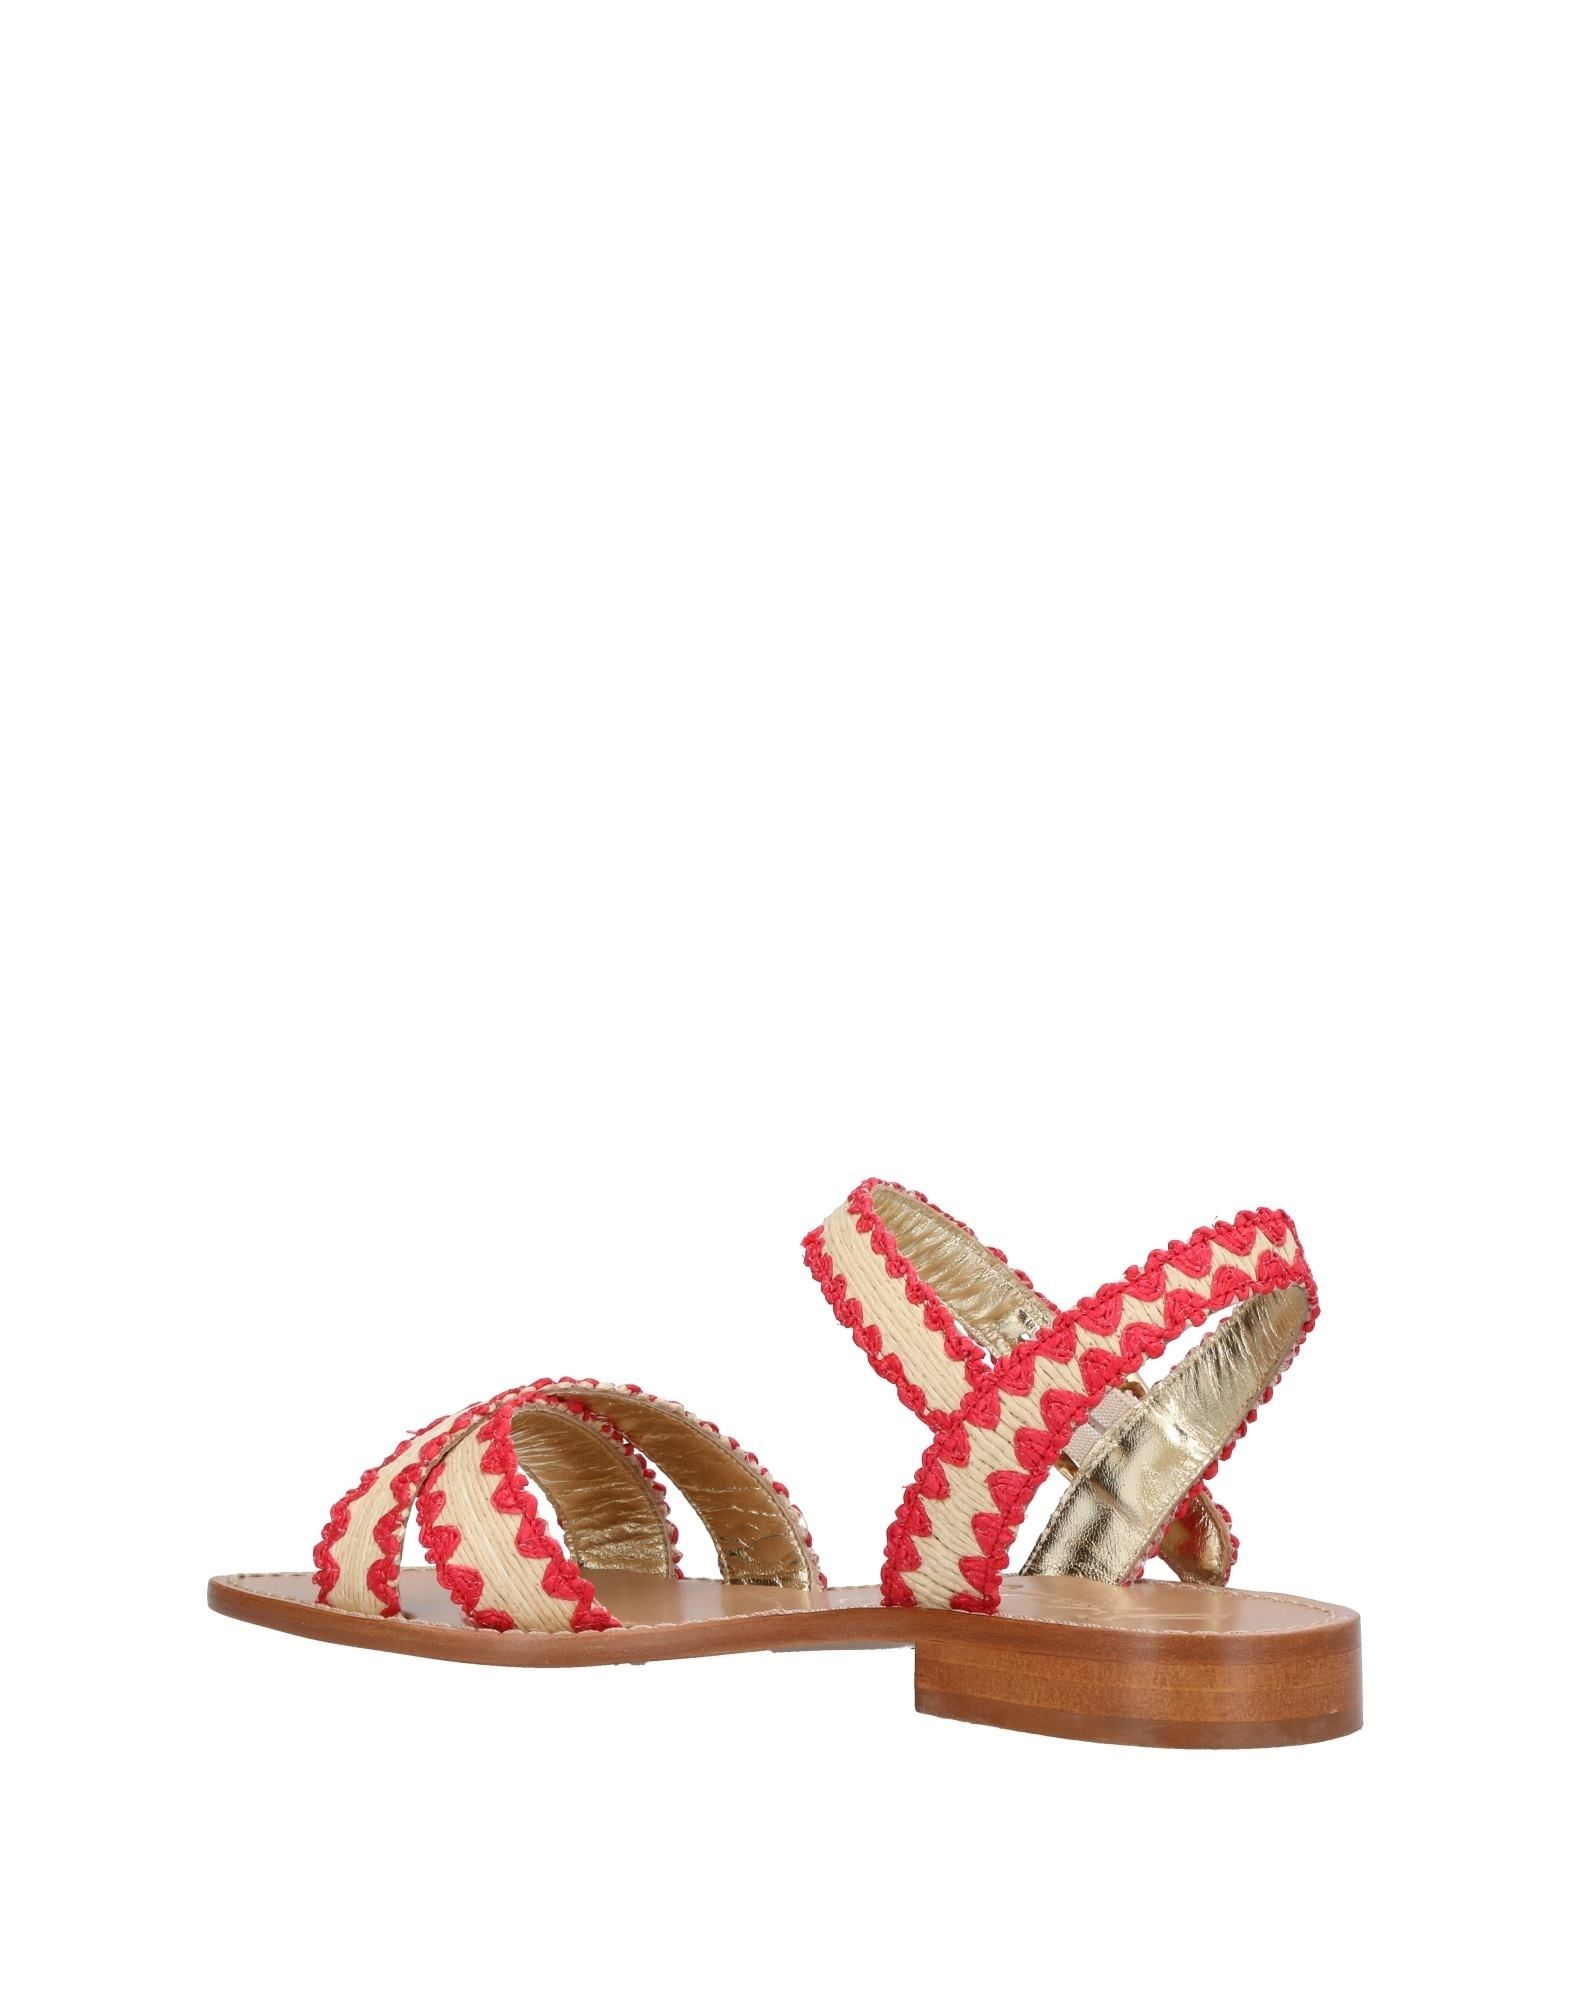 Gut M. um billige Schuhe zu tragenSofia M. Gut Sandalen Damen  11408087JC 77403f